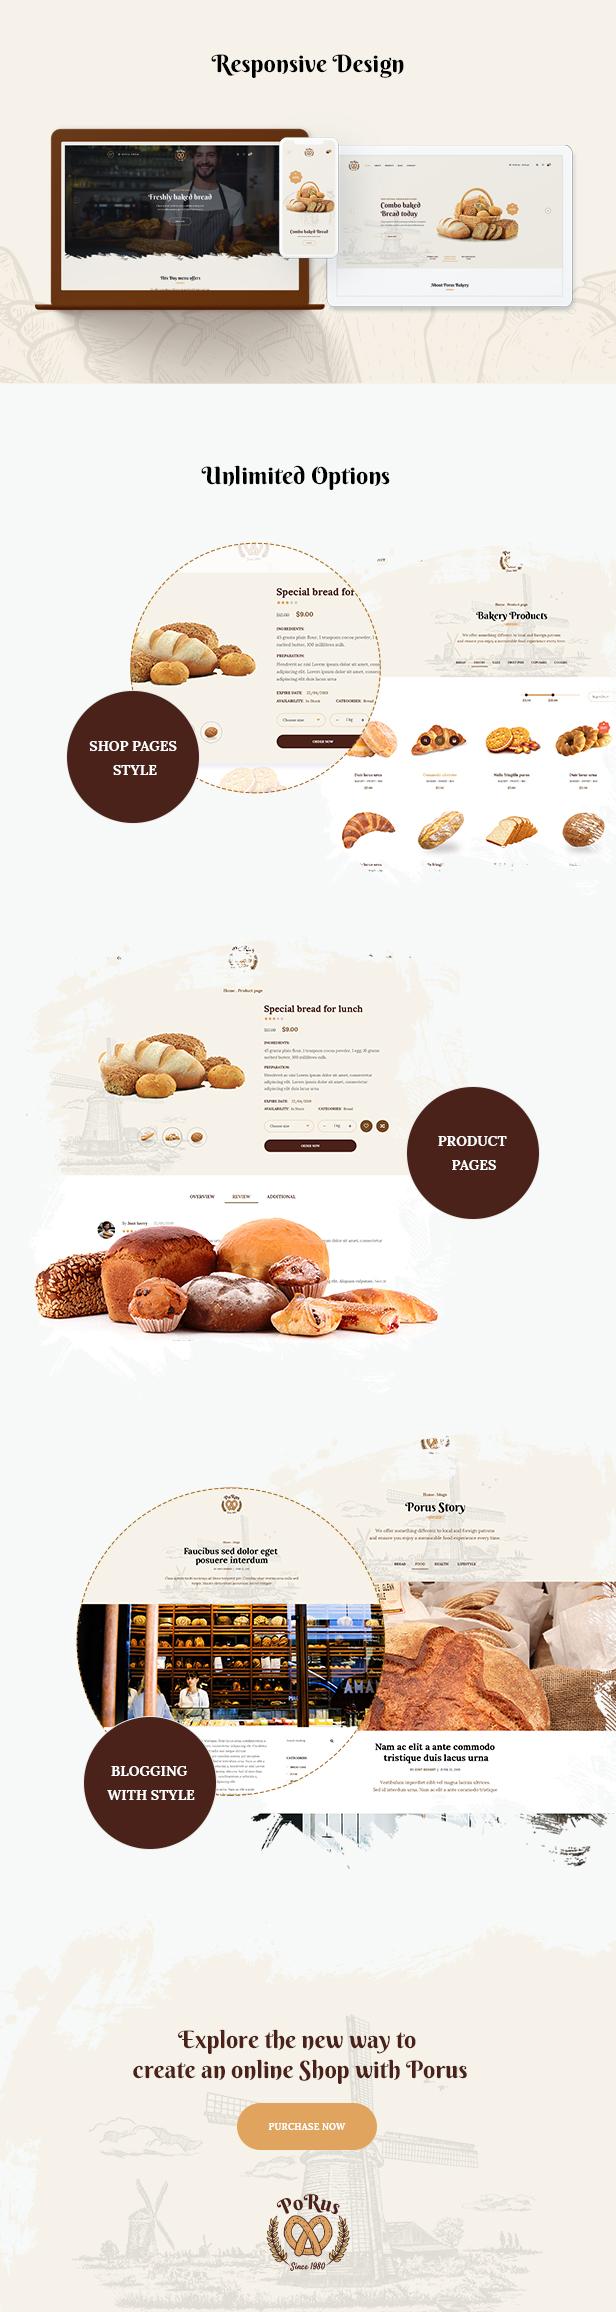 Porus - Bakery Store WordPress Theme - 10